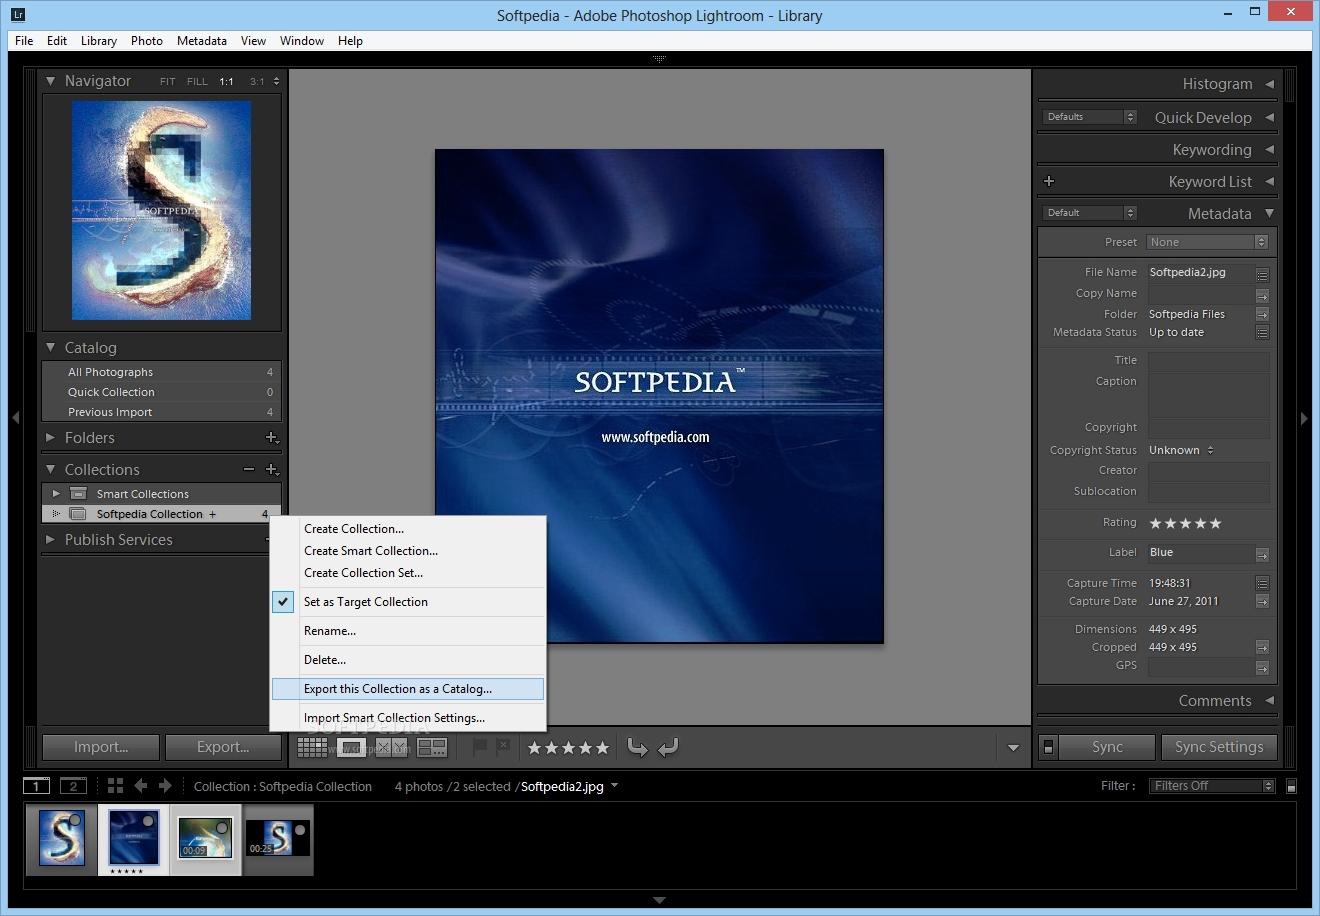 Adobe Photoshop Lightroom Screen Shot